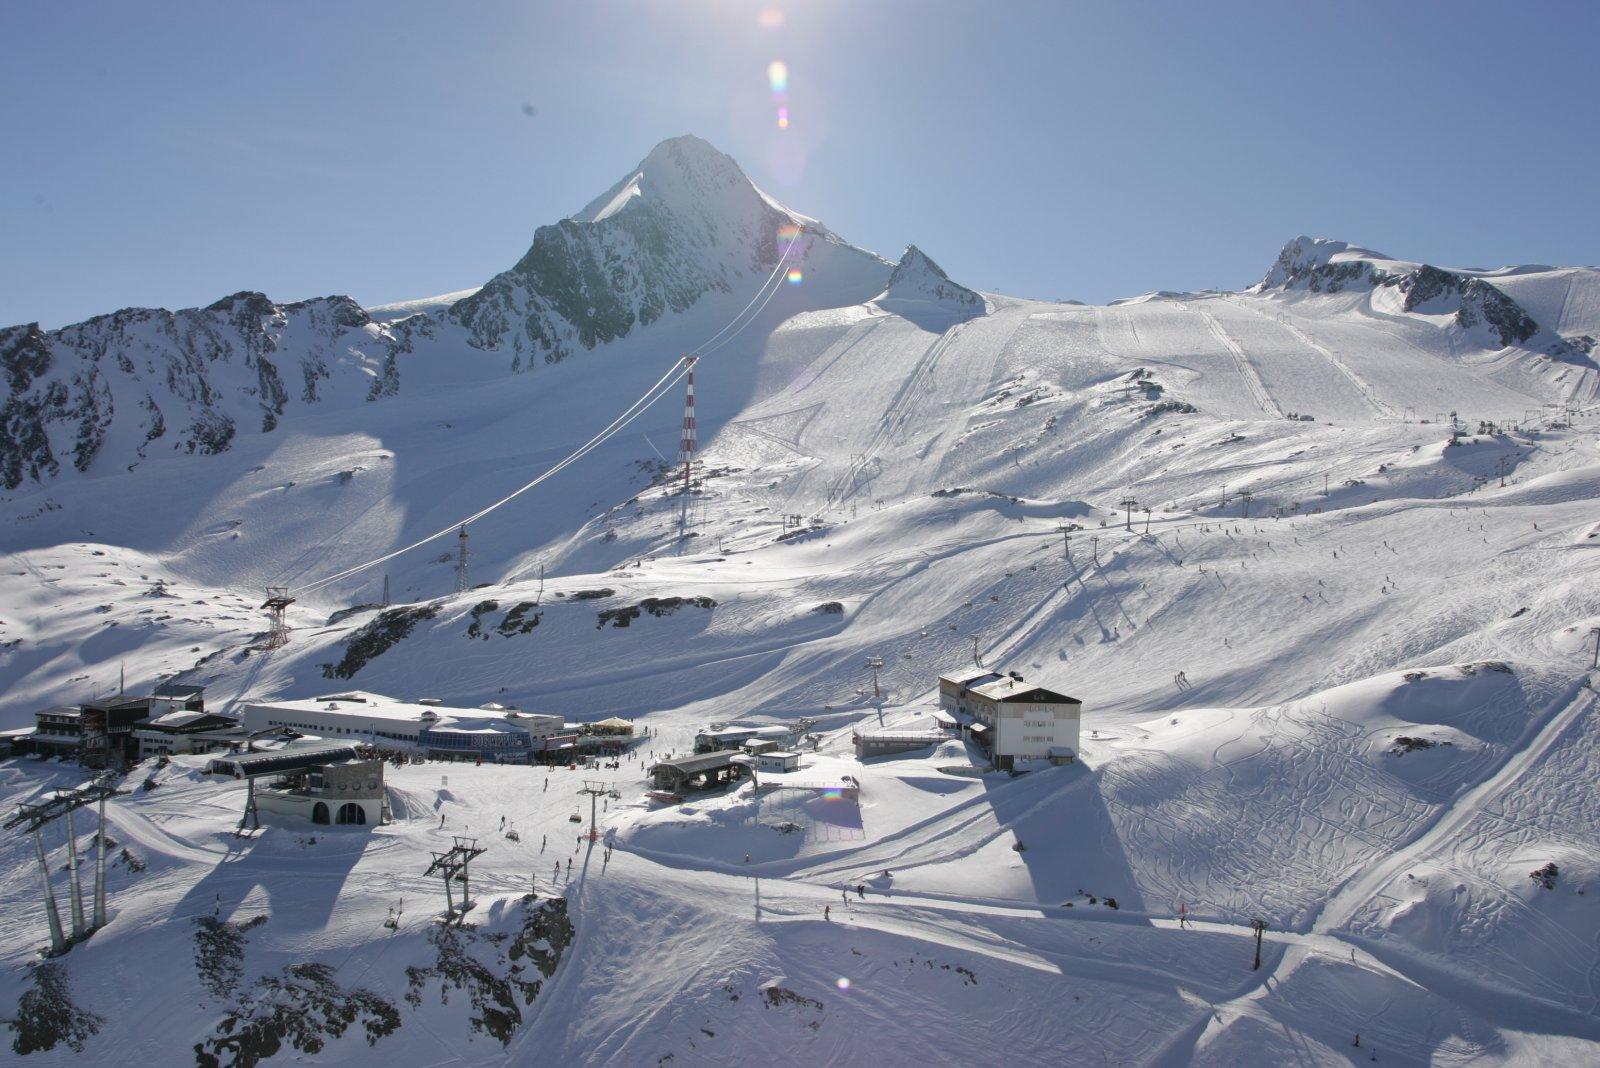 Kitzsteinhorn Images & Pictures - Findpik